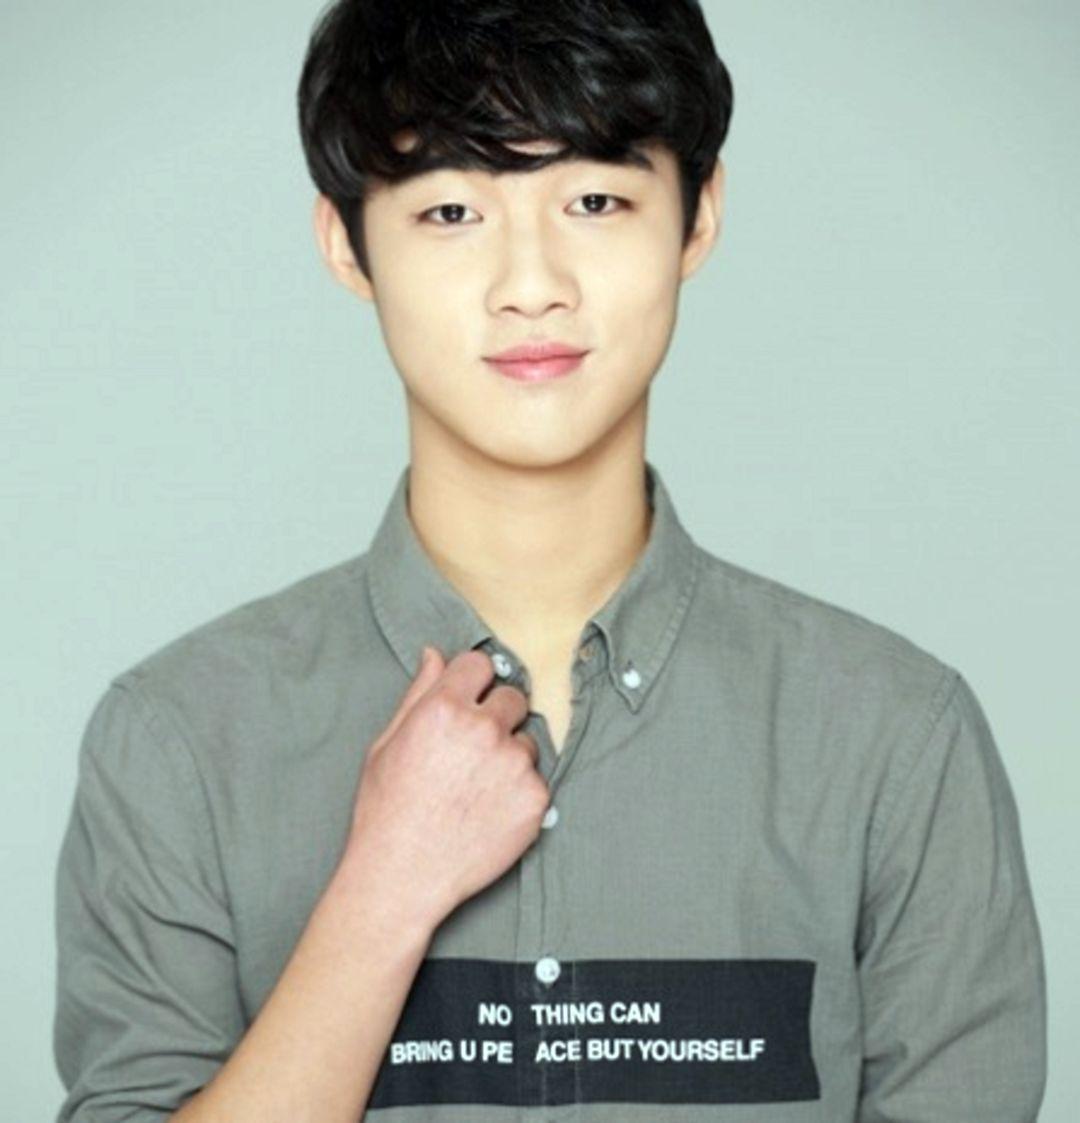 Lee Jae Baek